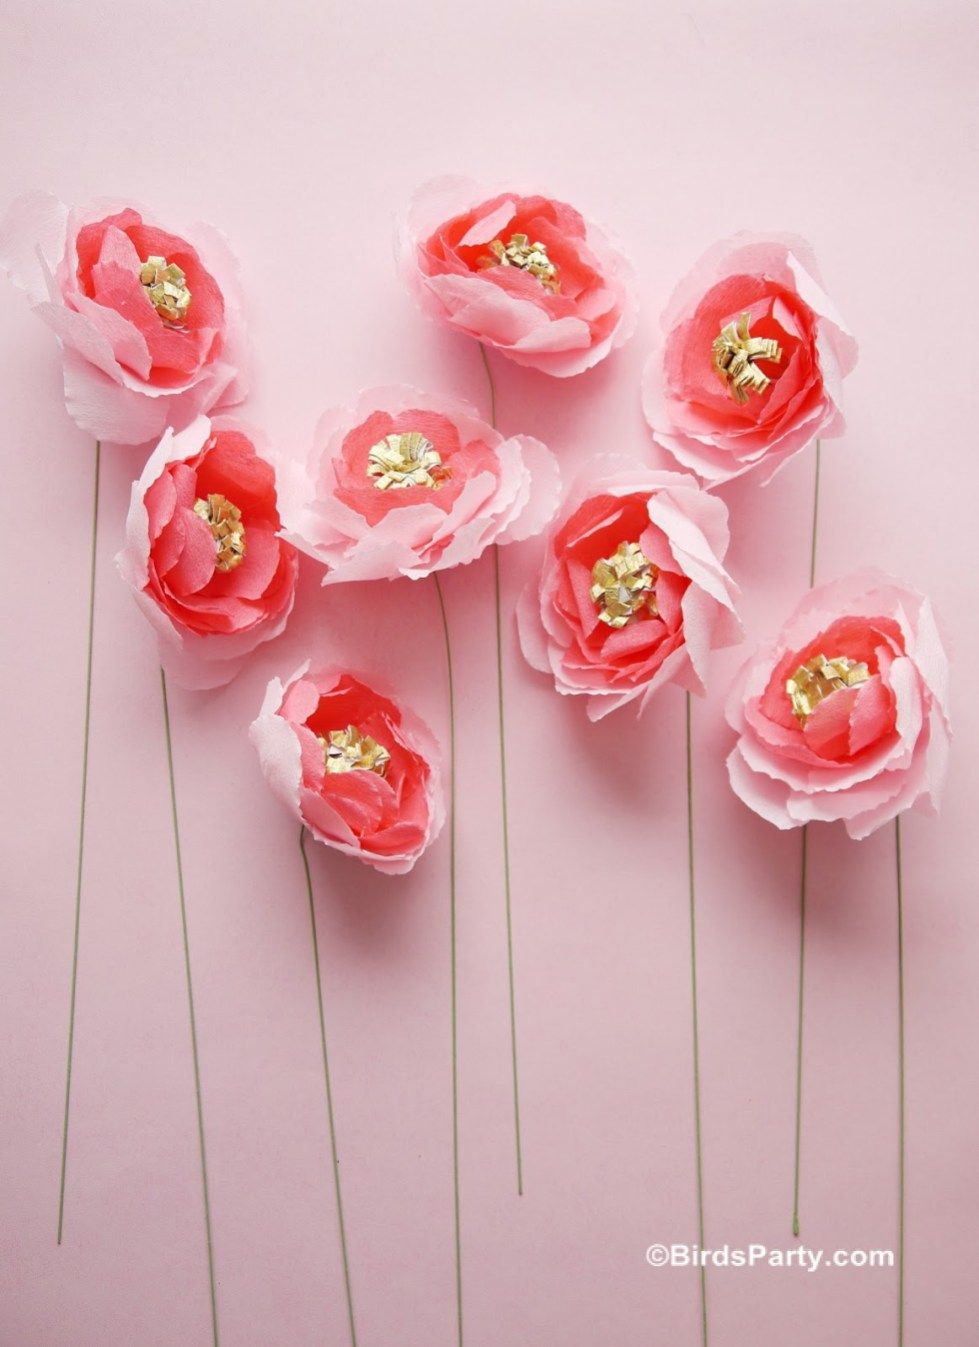 Best Paper Flower Tutorials For Your Wedding Easy Crepe Paper